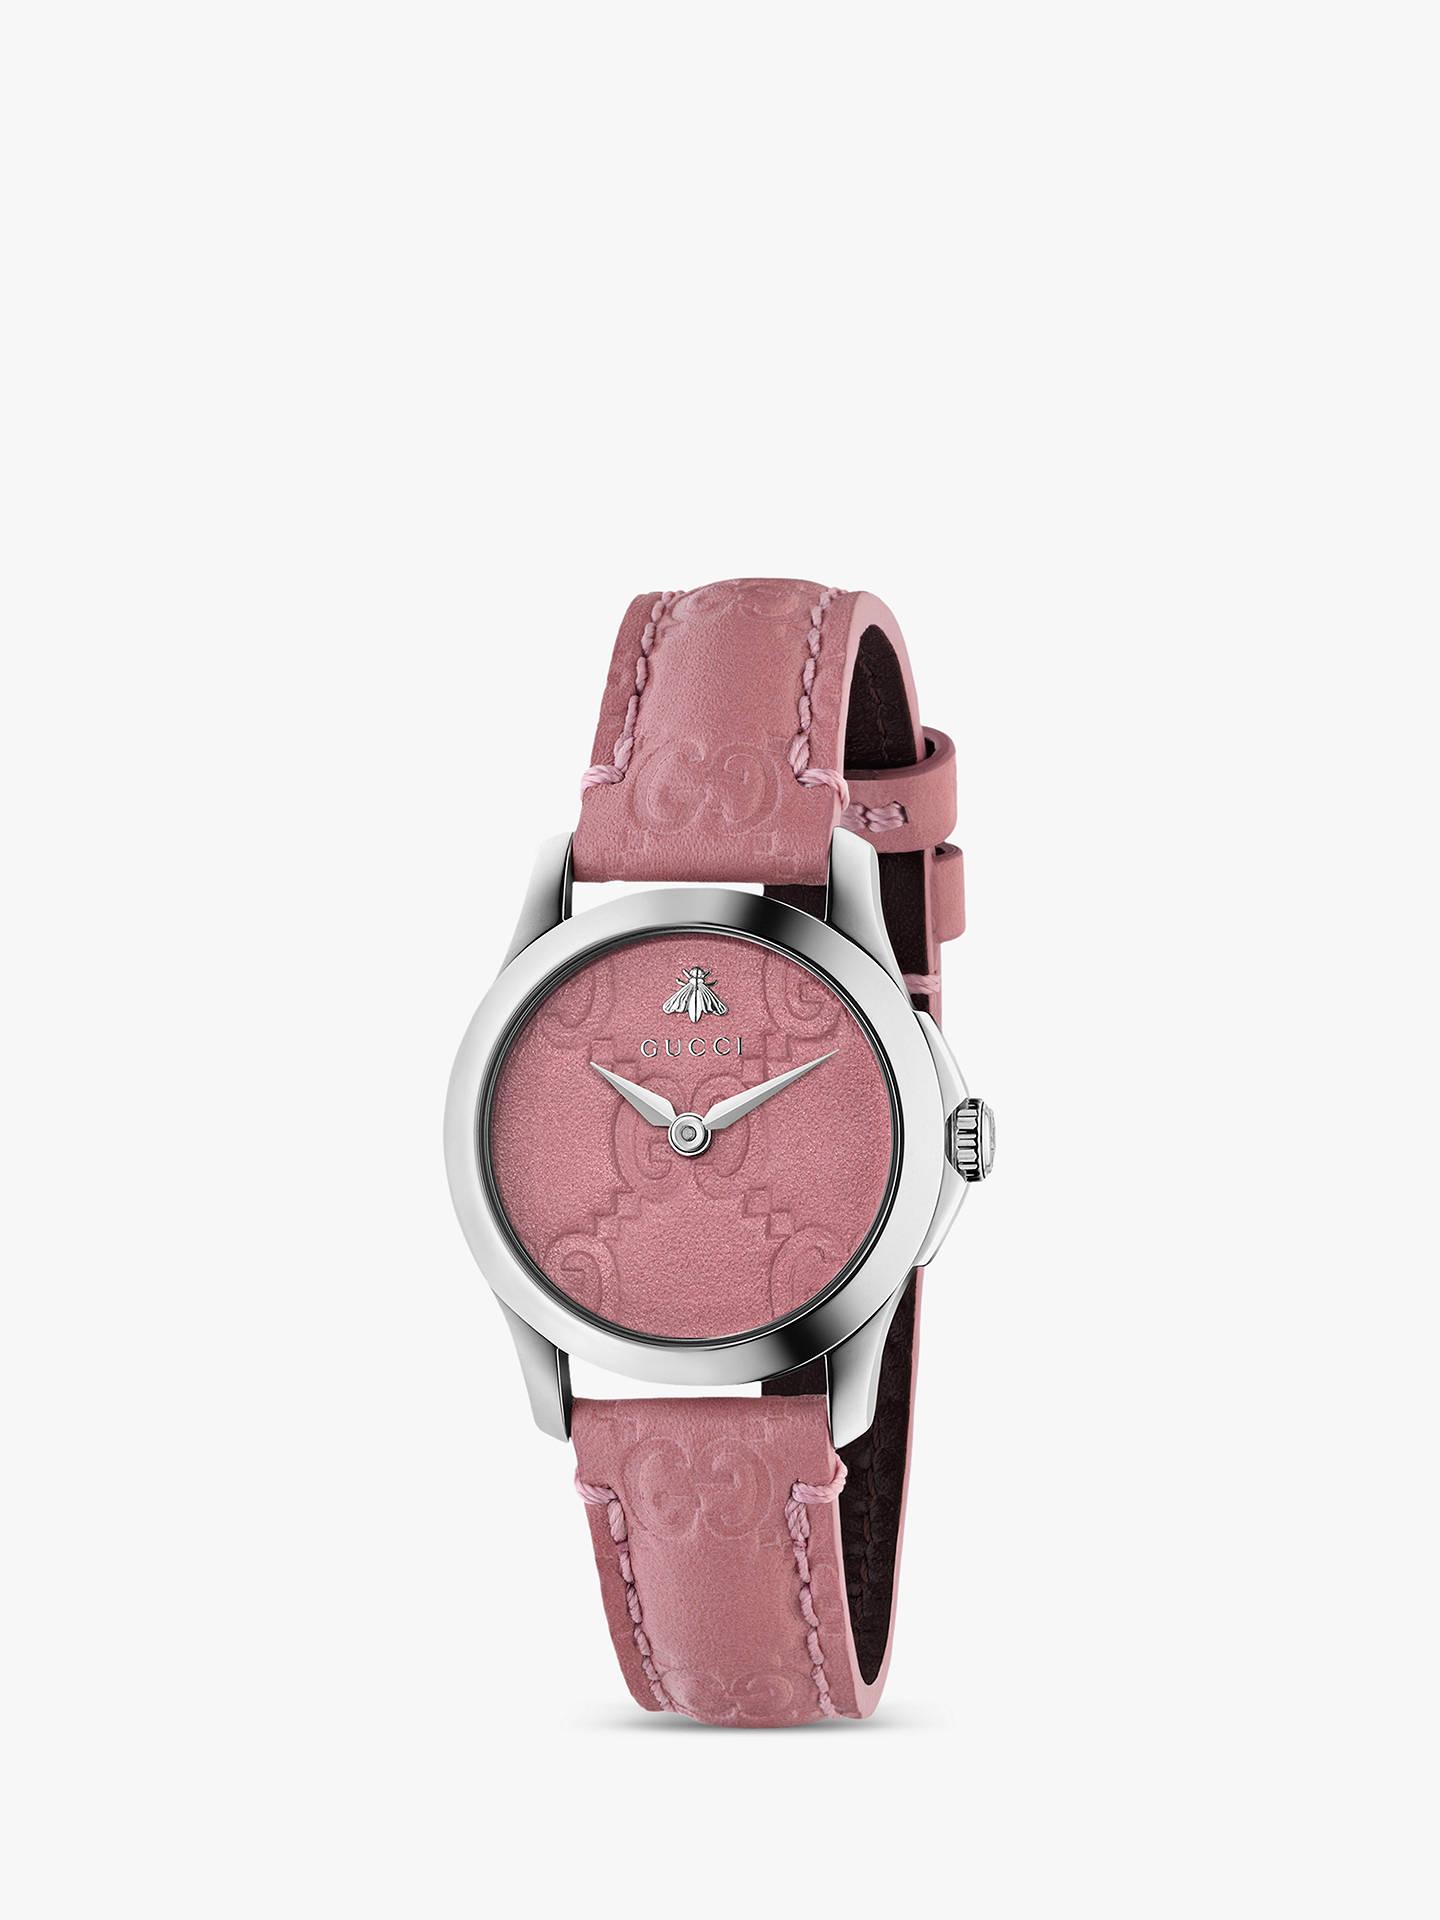 bbf2e1ad2e2 Gucci YA126578 Women s G-Timeless Signature Leather Strap Watch ...